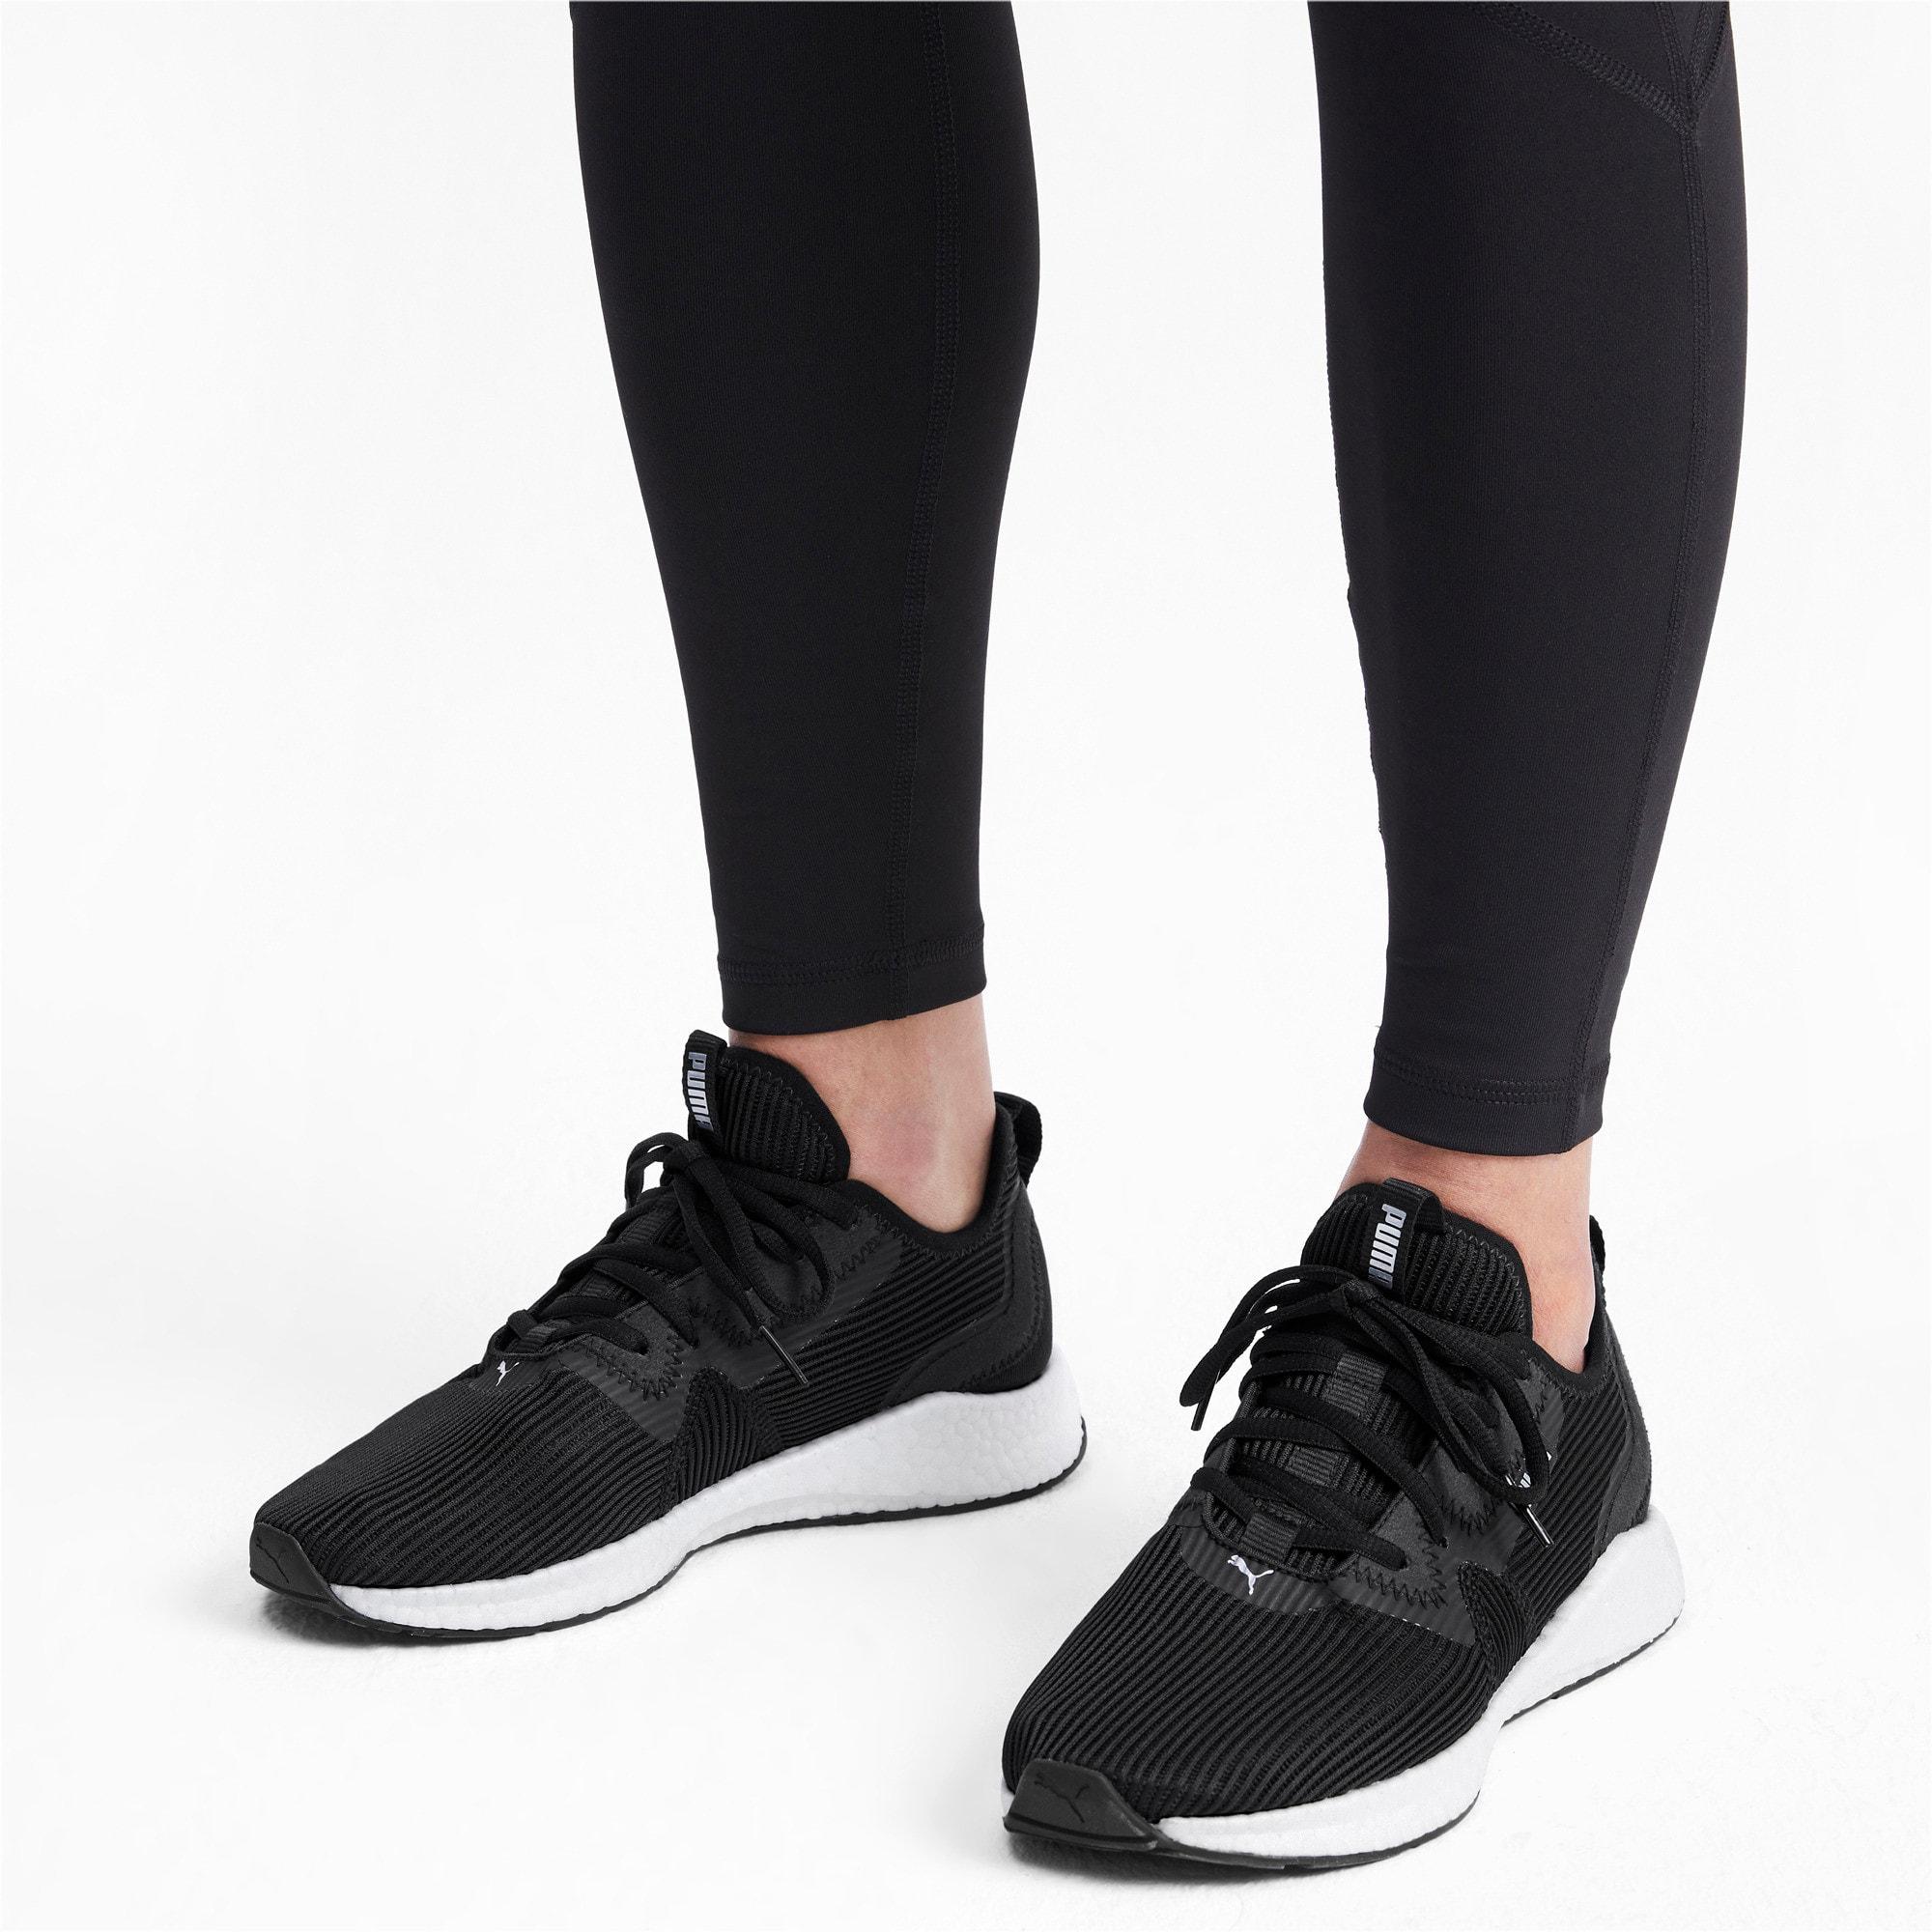 Thumbnail 3 of NRGY Star Femme Women's Running Shoes, Black-Silver-White, medium-IND